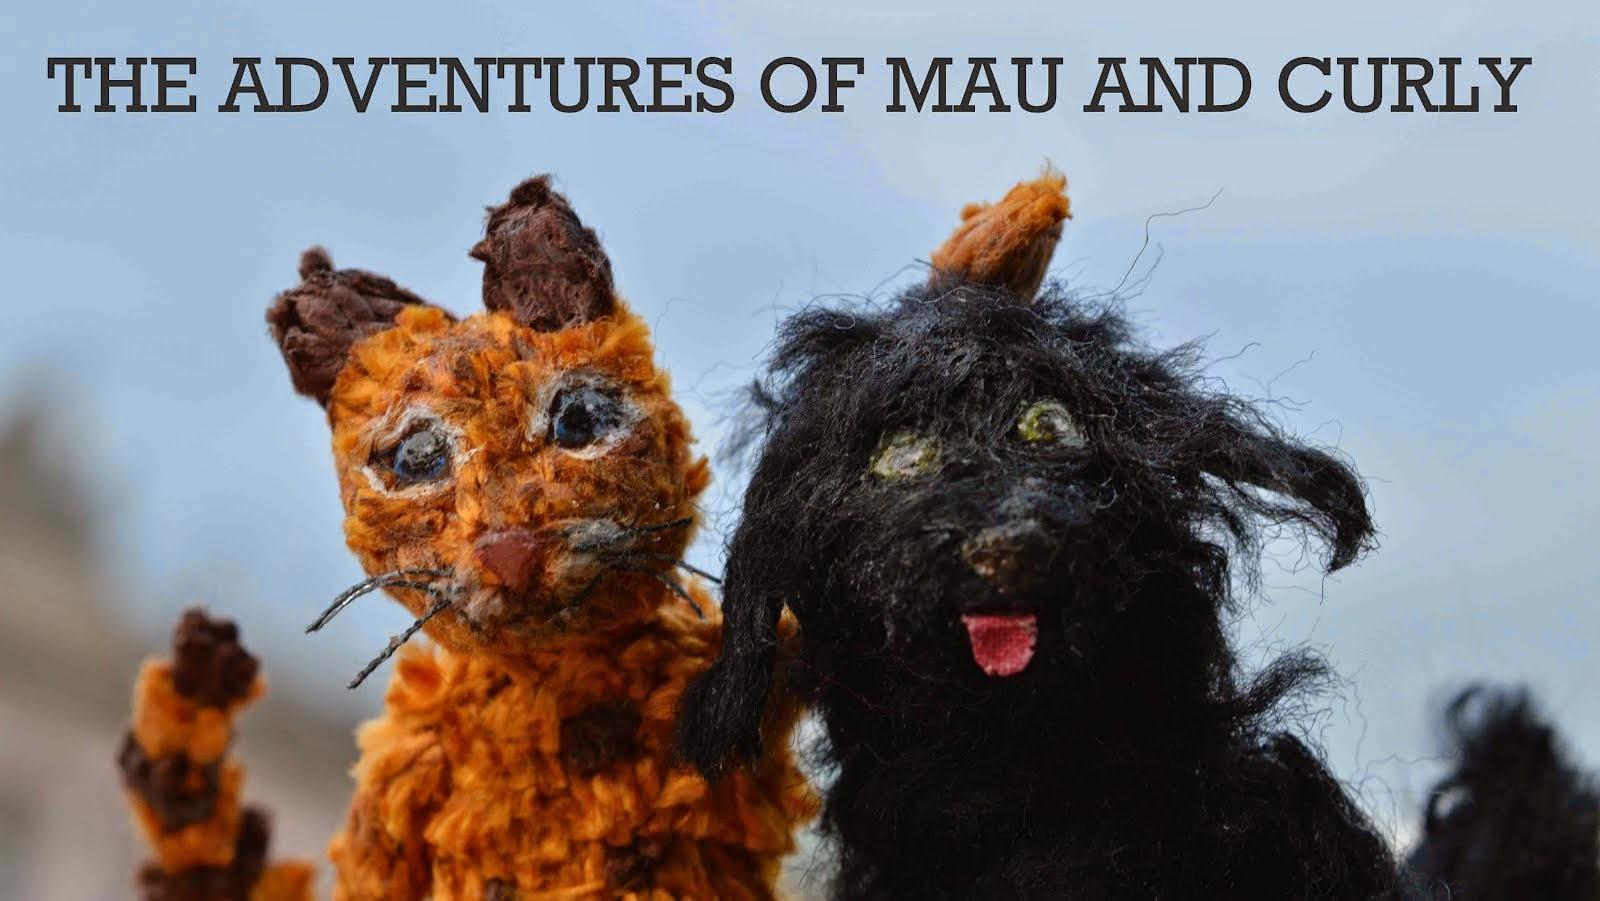 Mau & Curly